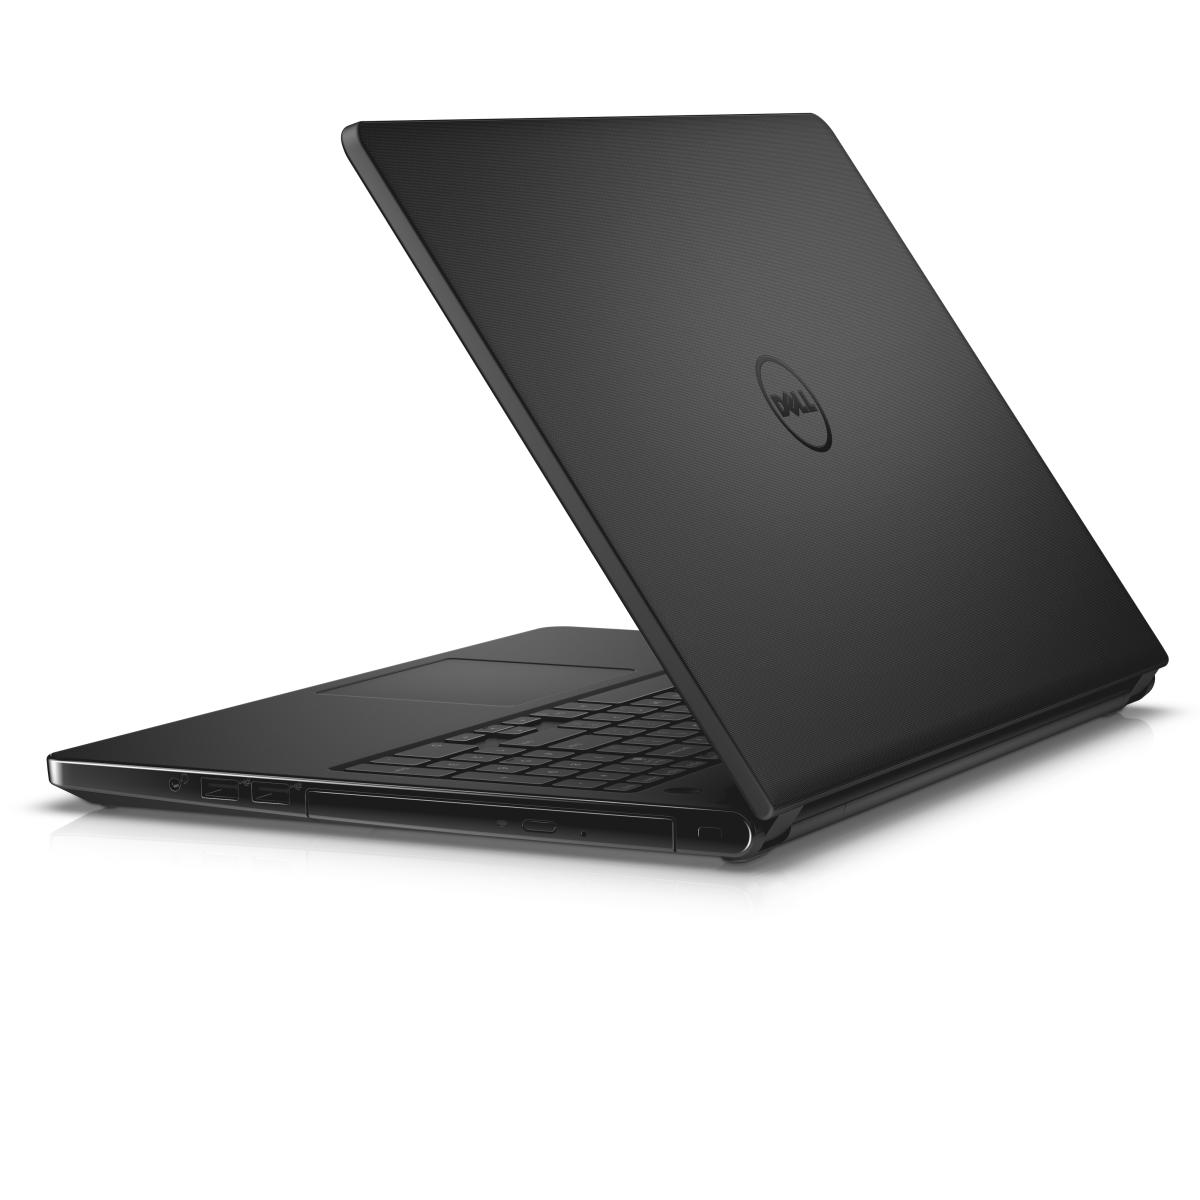 Dell unveils new Inspiron laptops - NotebookCheck.net News